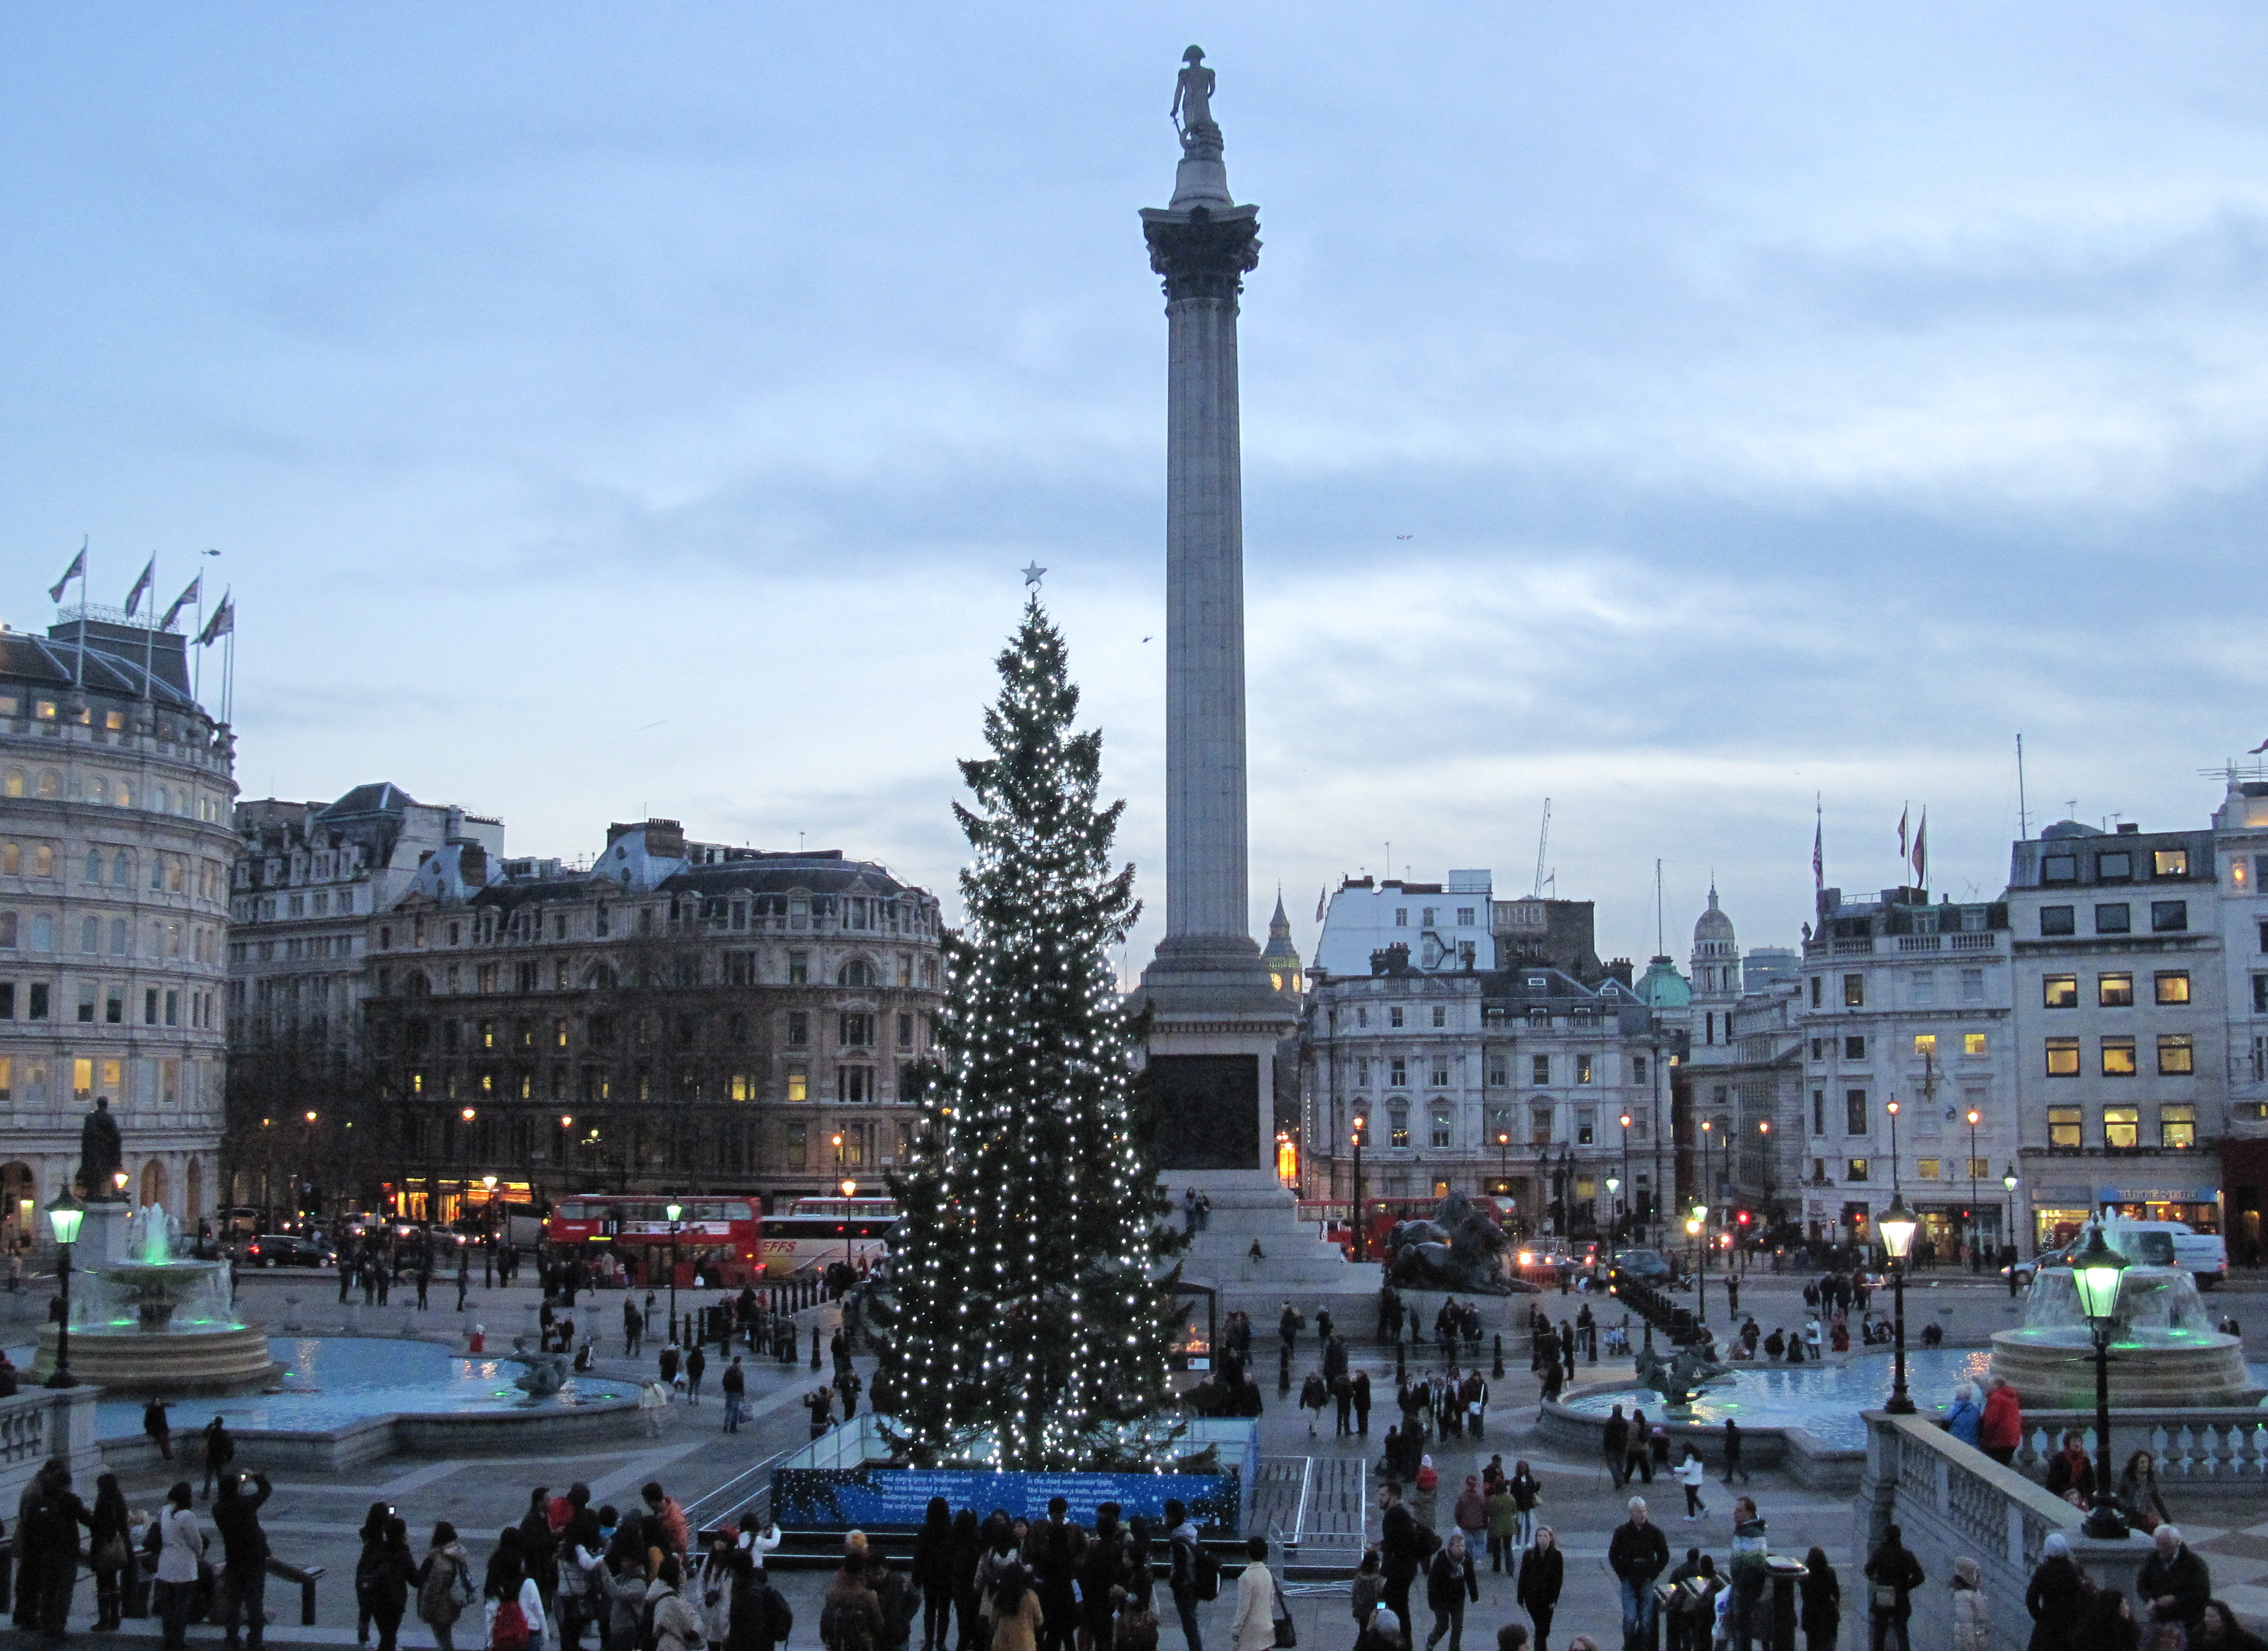 File:Christmas tree London 2012 09.jpg - Wikimedia Commons